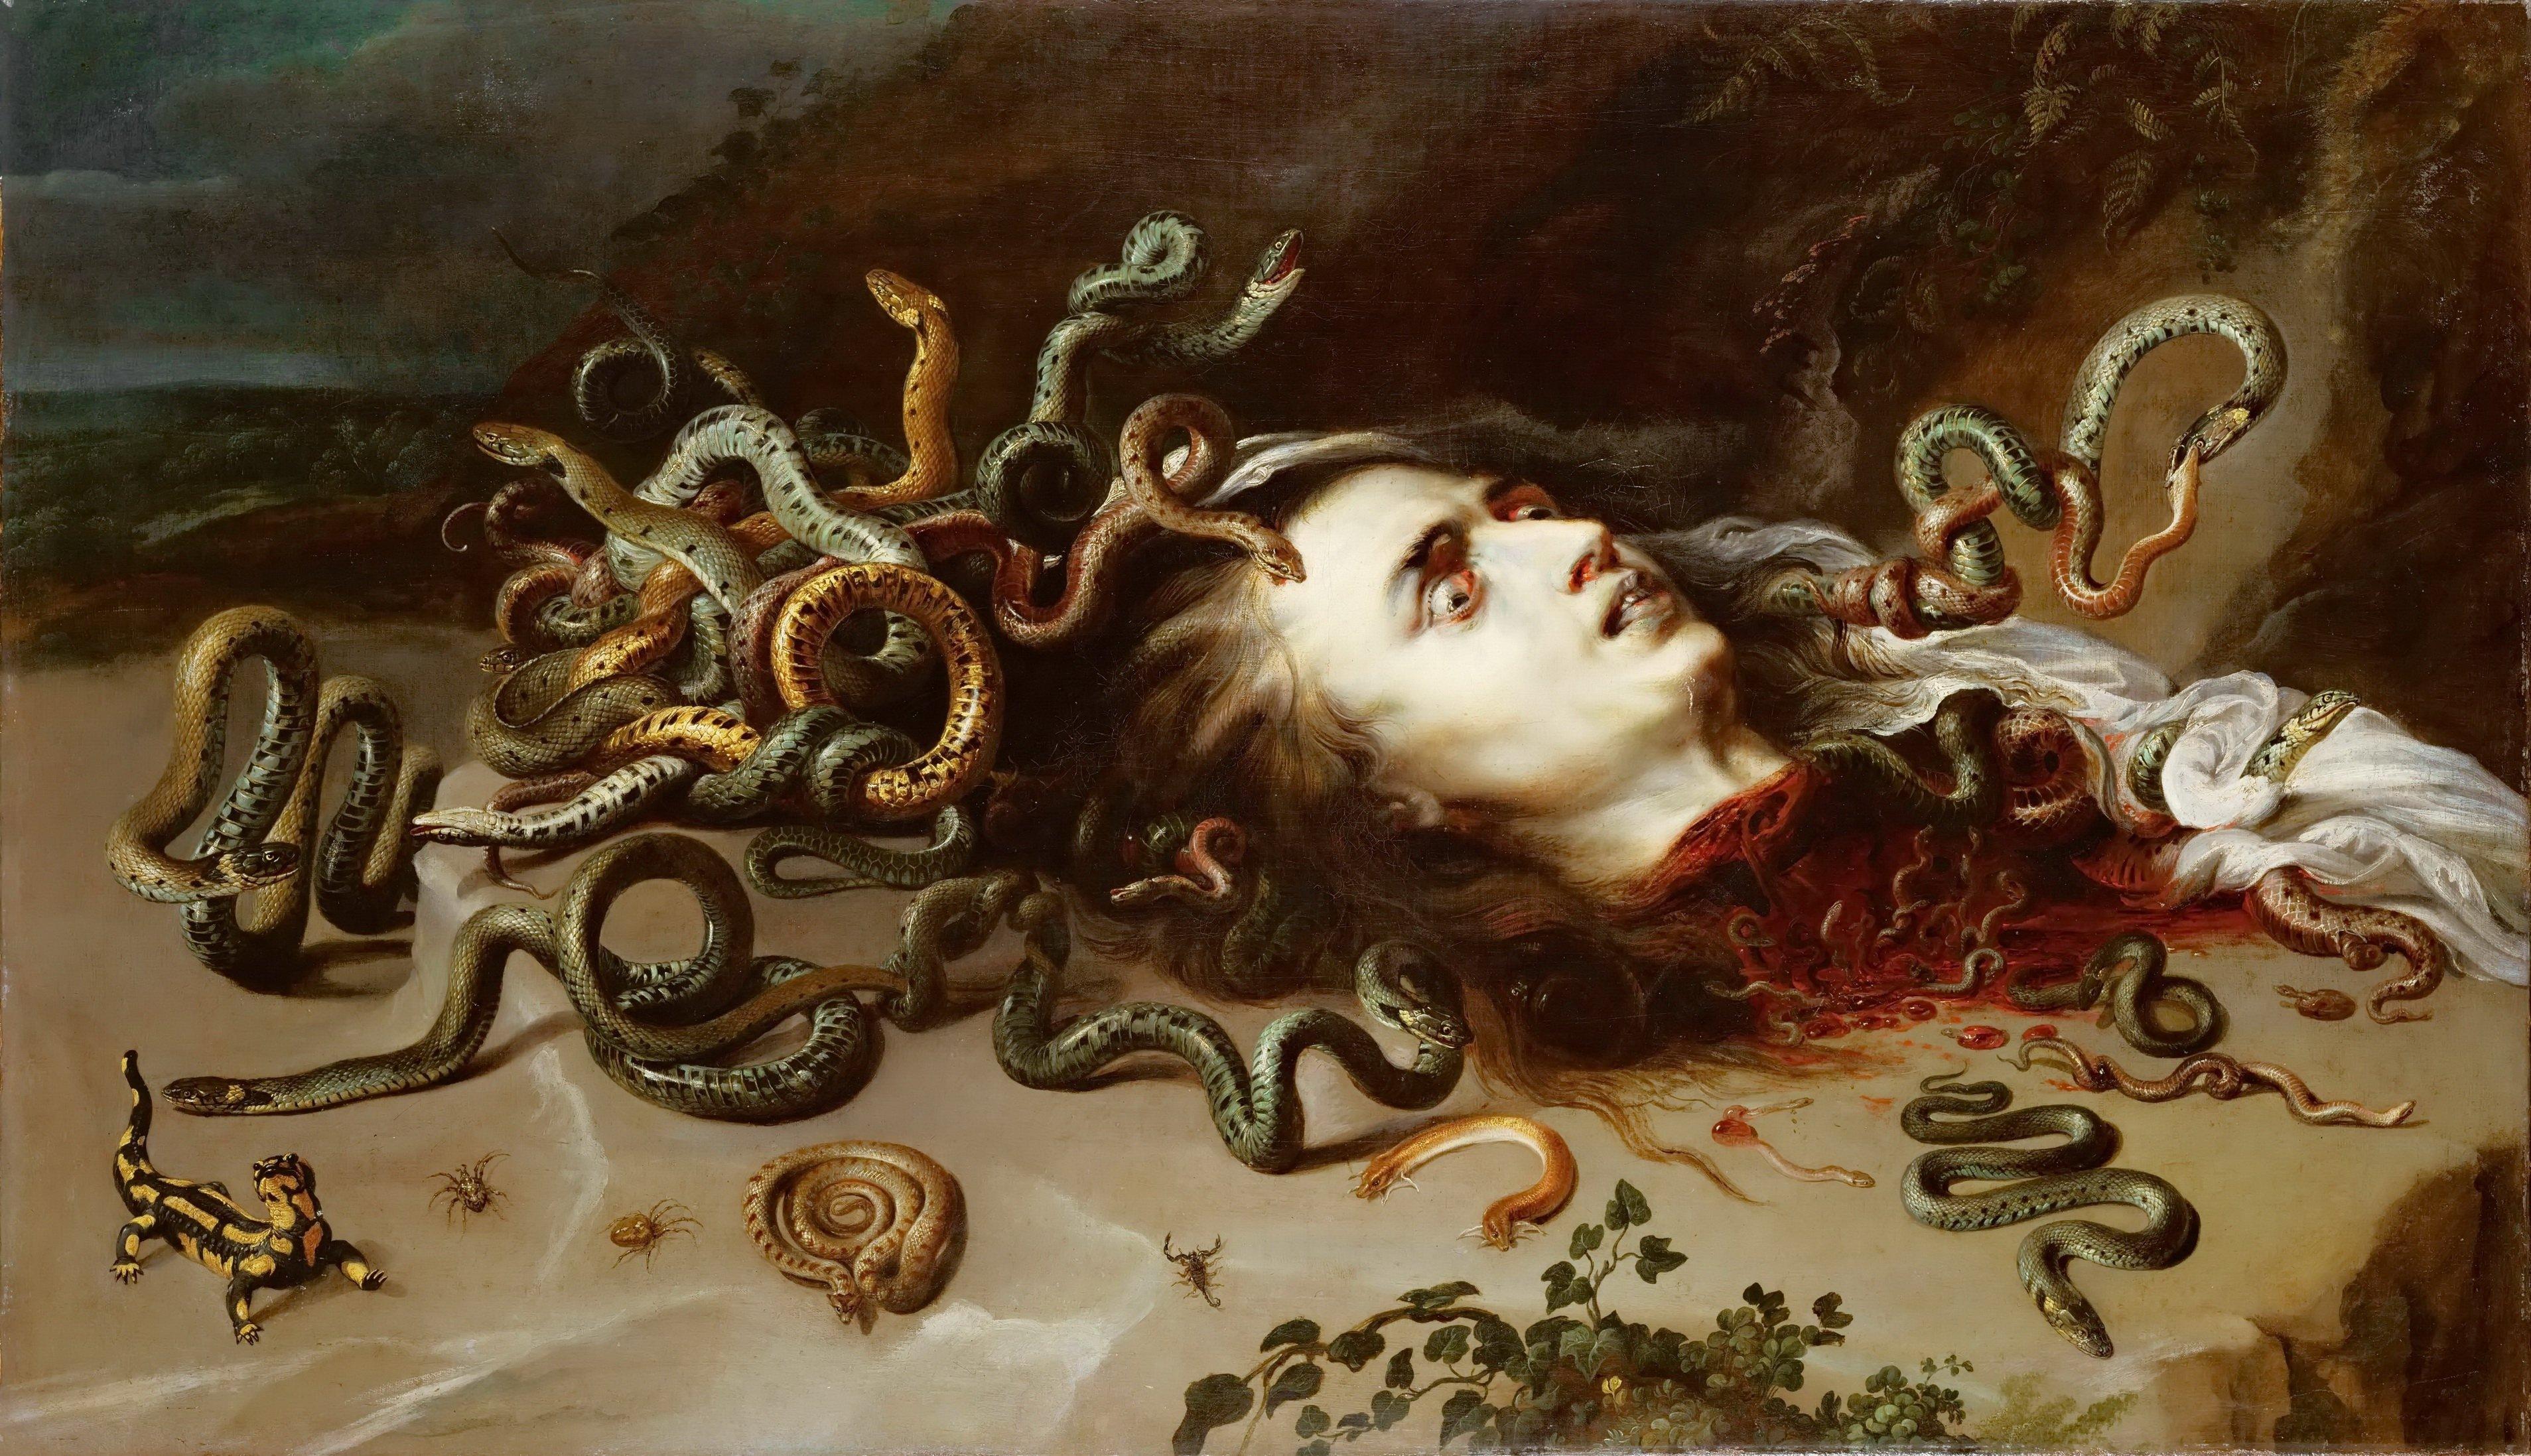 Medusa wallpaper 1920x1080 292471 wallpaperup medusa serpent snake blood fantasy dark horror wallpaper voltagebd Image collections